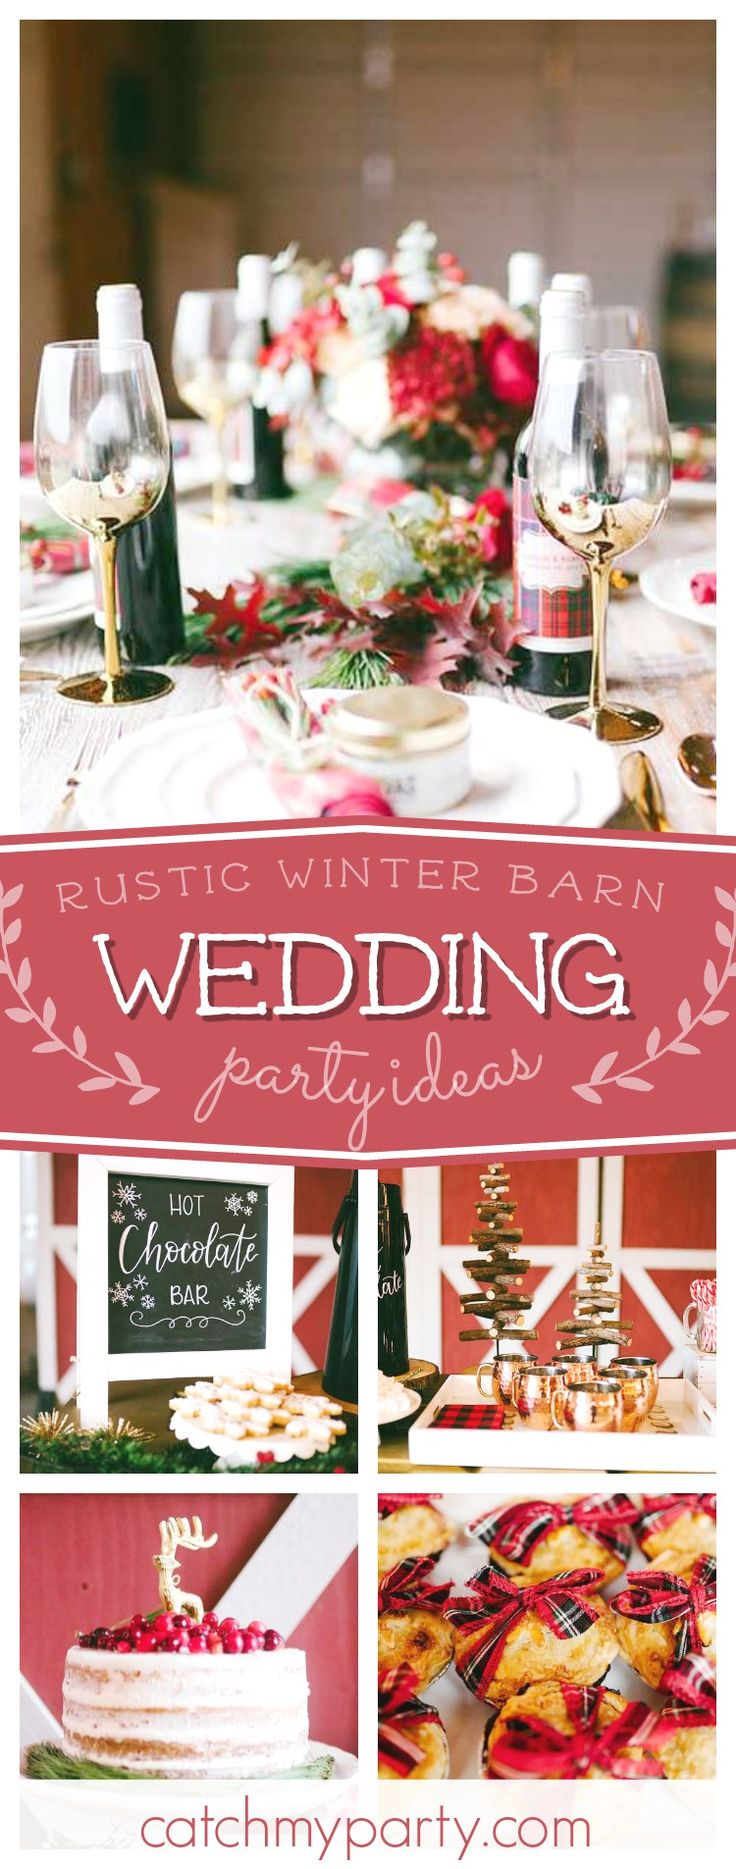 773 best Wedding Ideas images on Pinterest | Wedding ideas, Colors ...